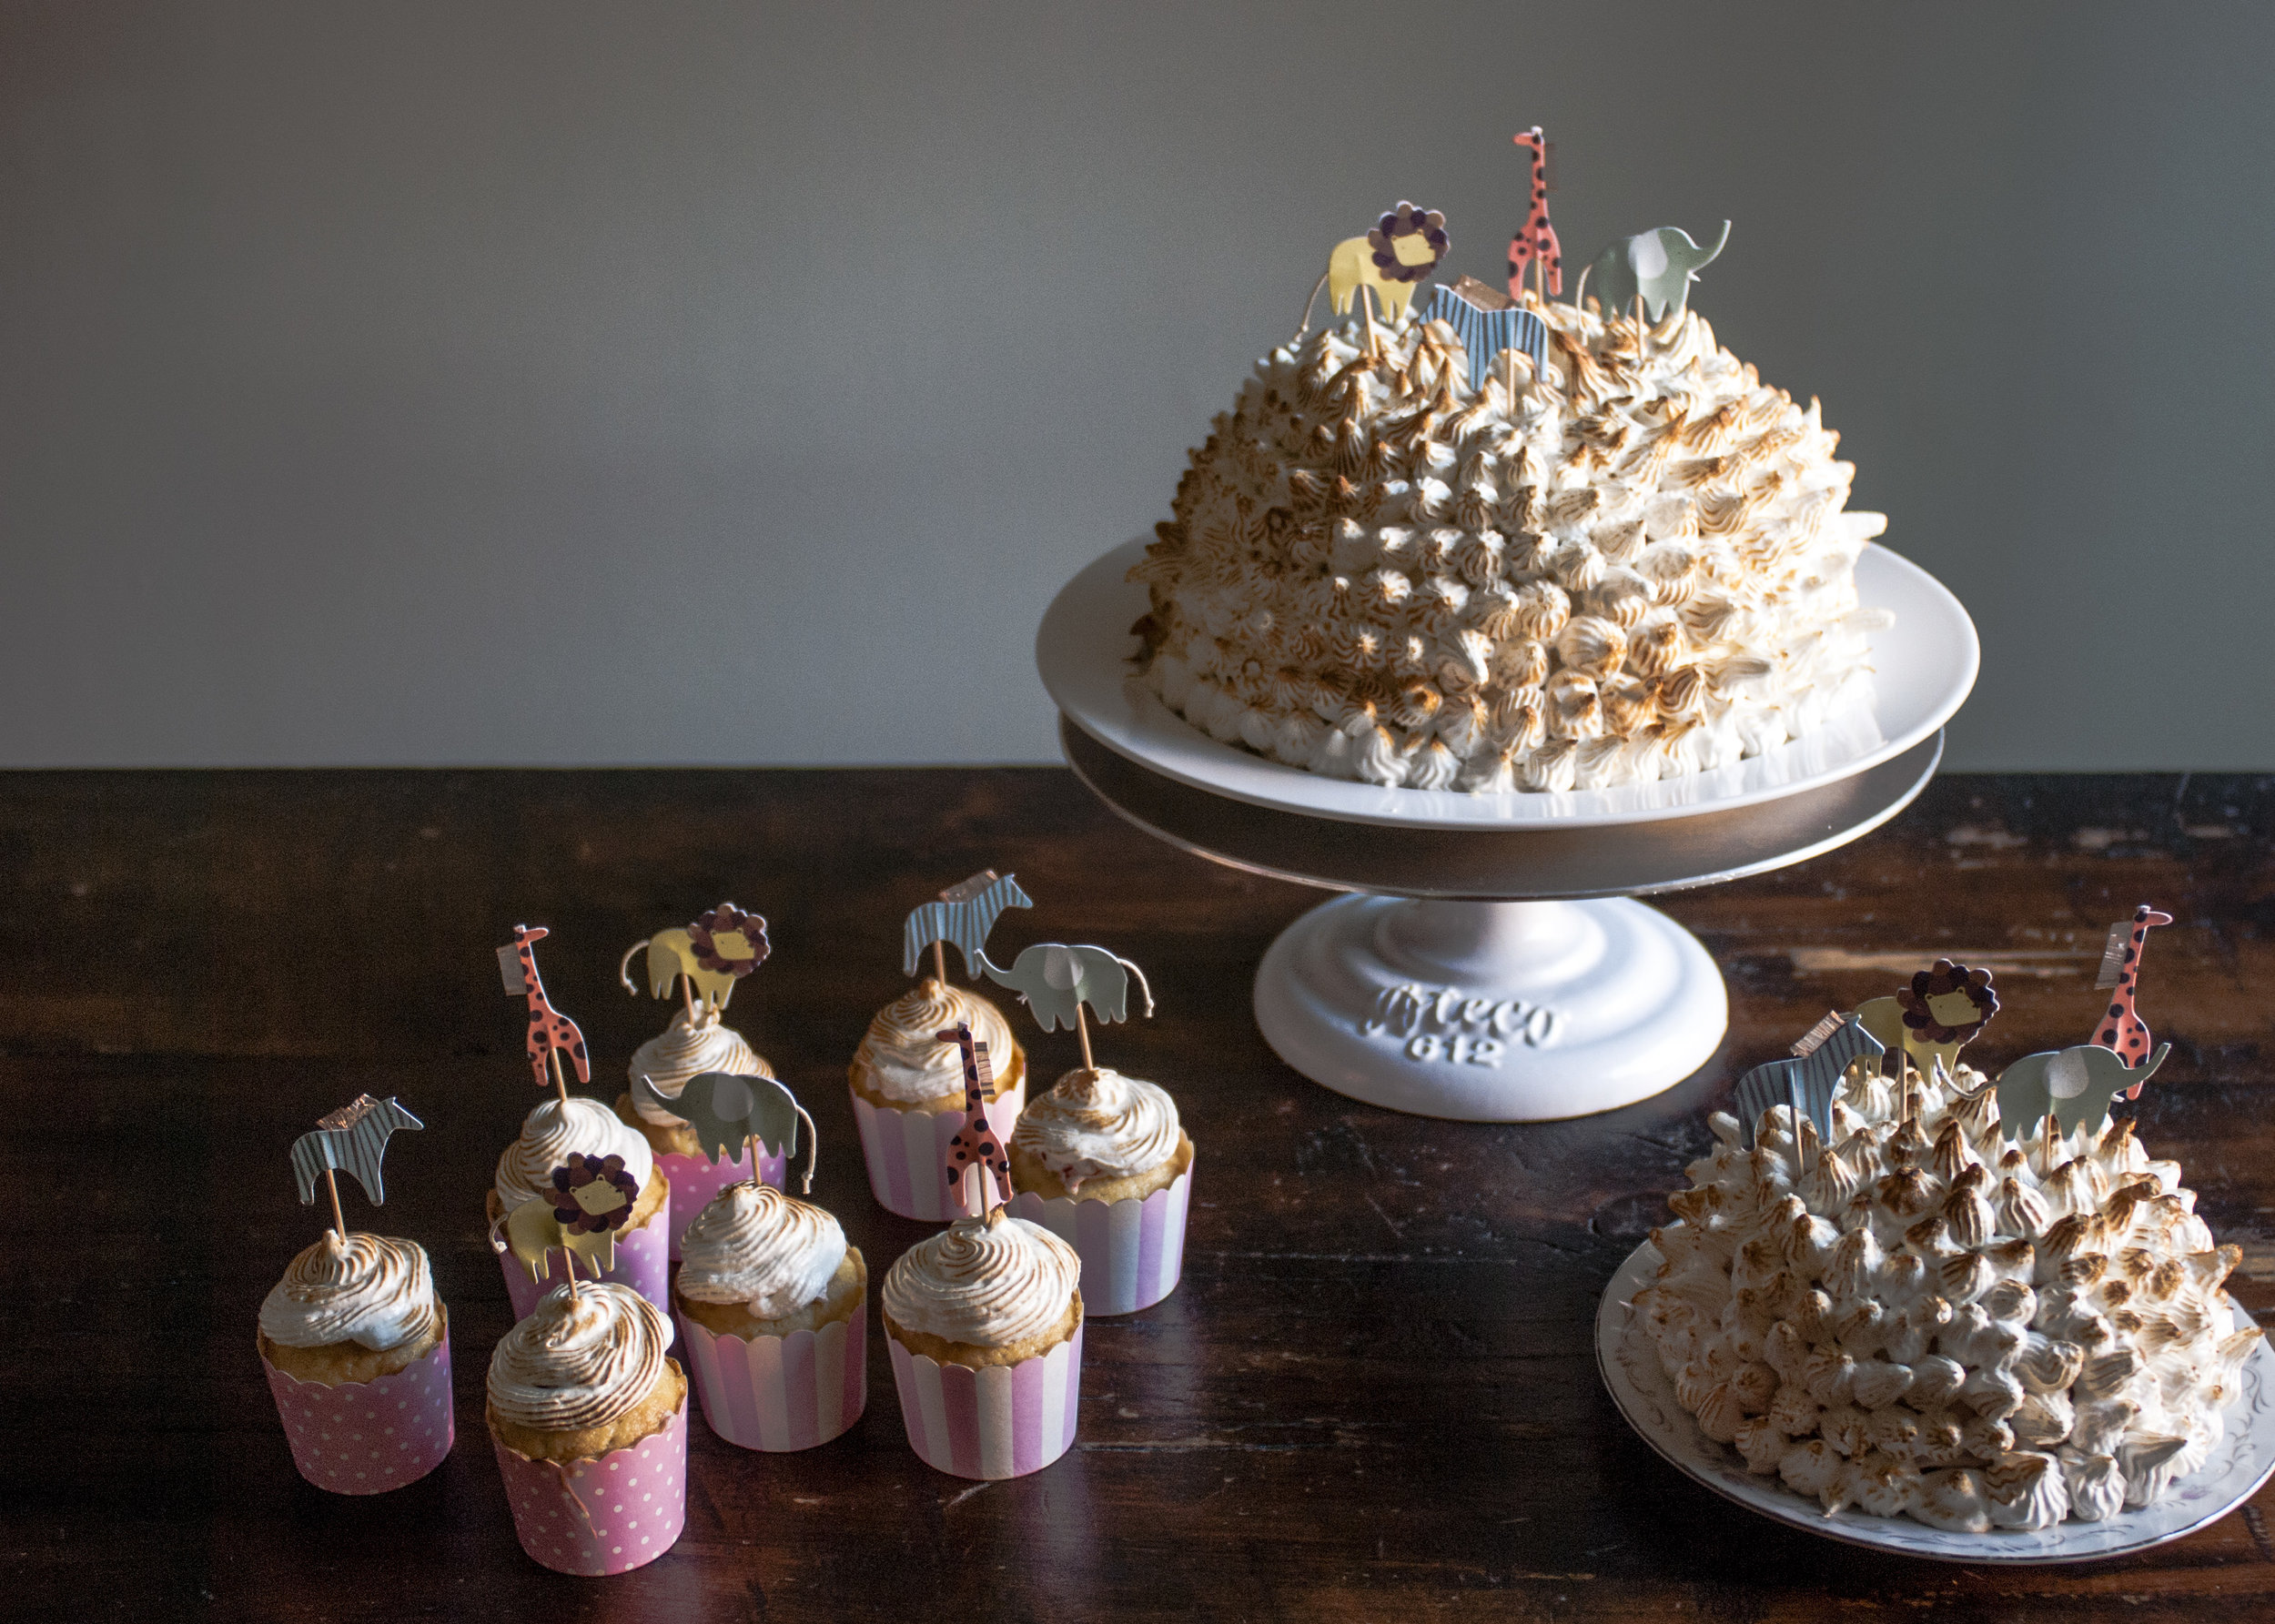 eleanors cakes.jpg